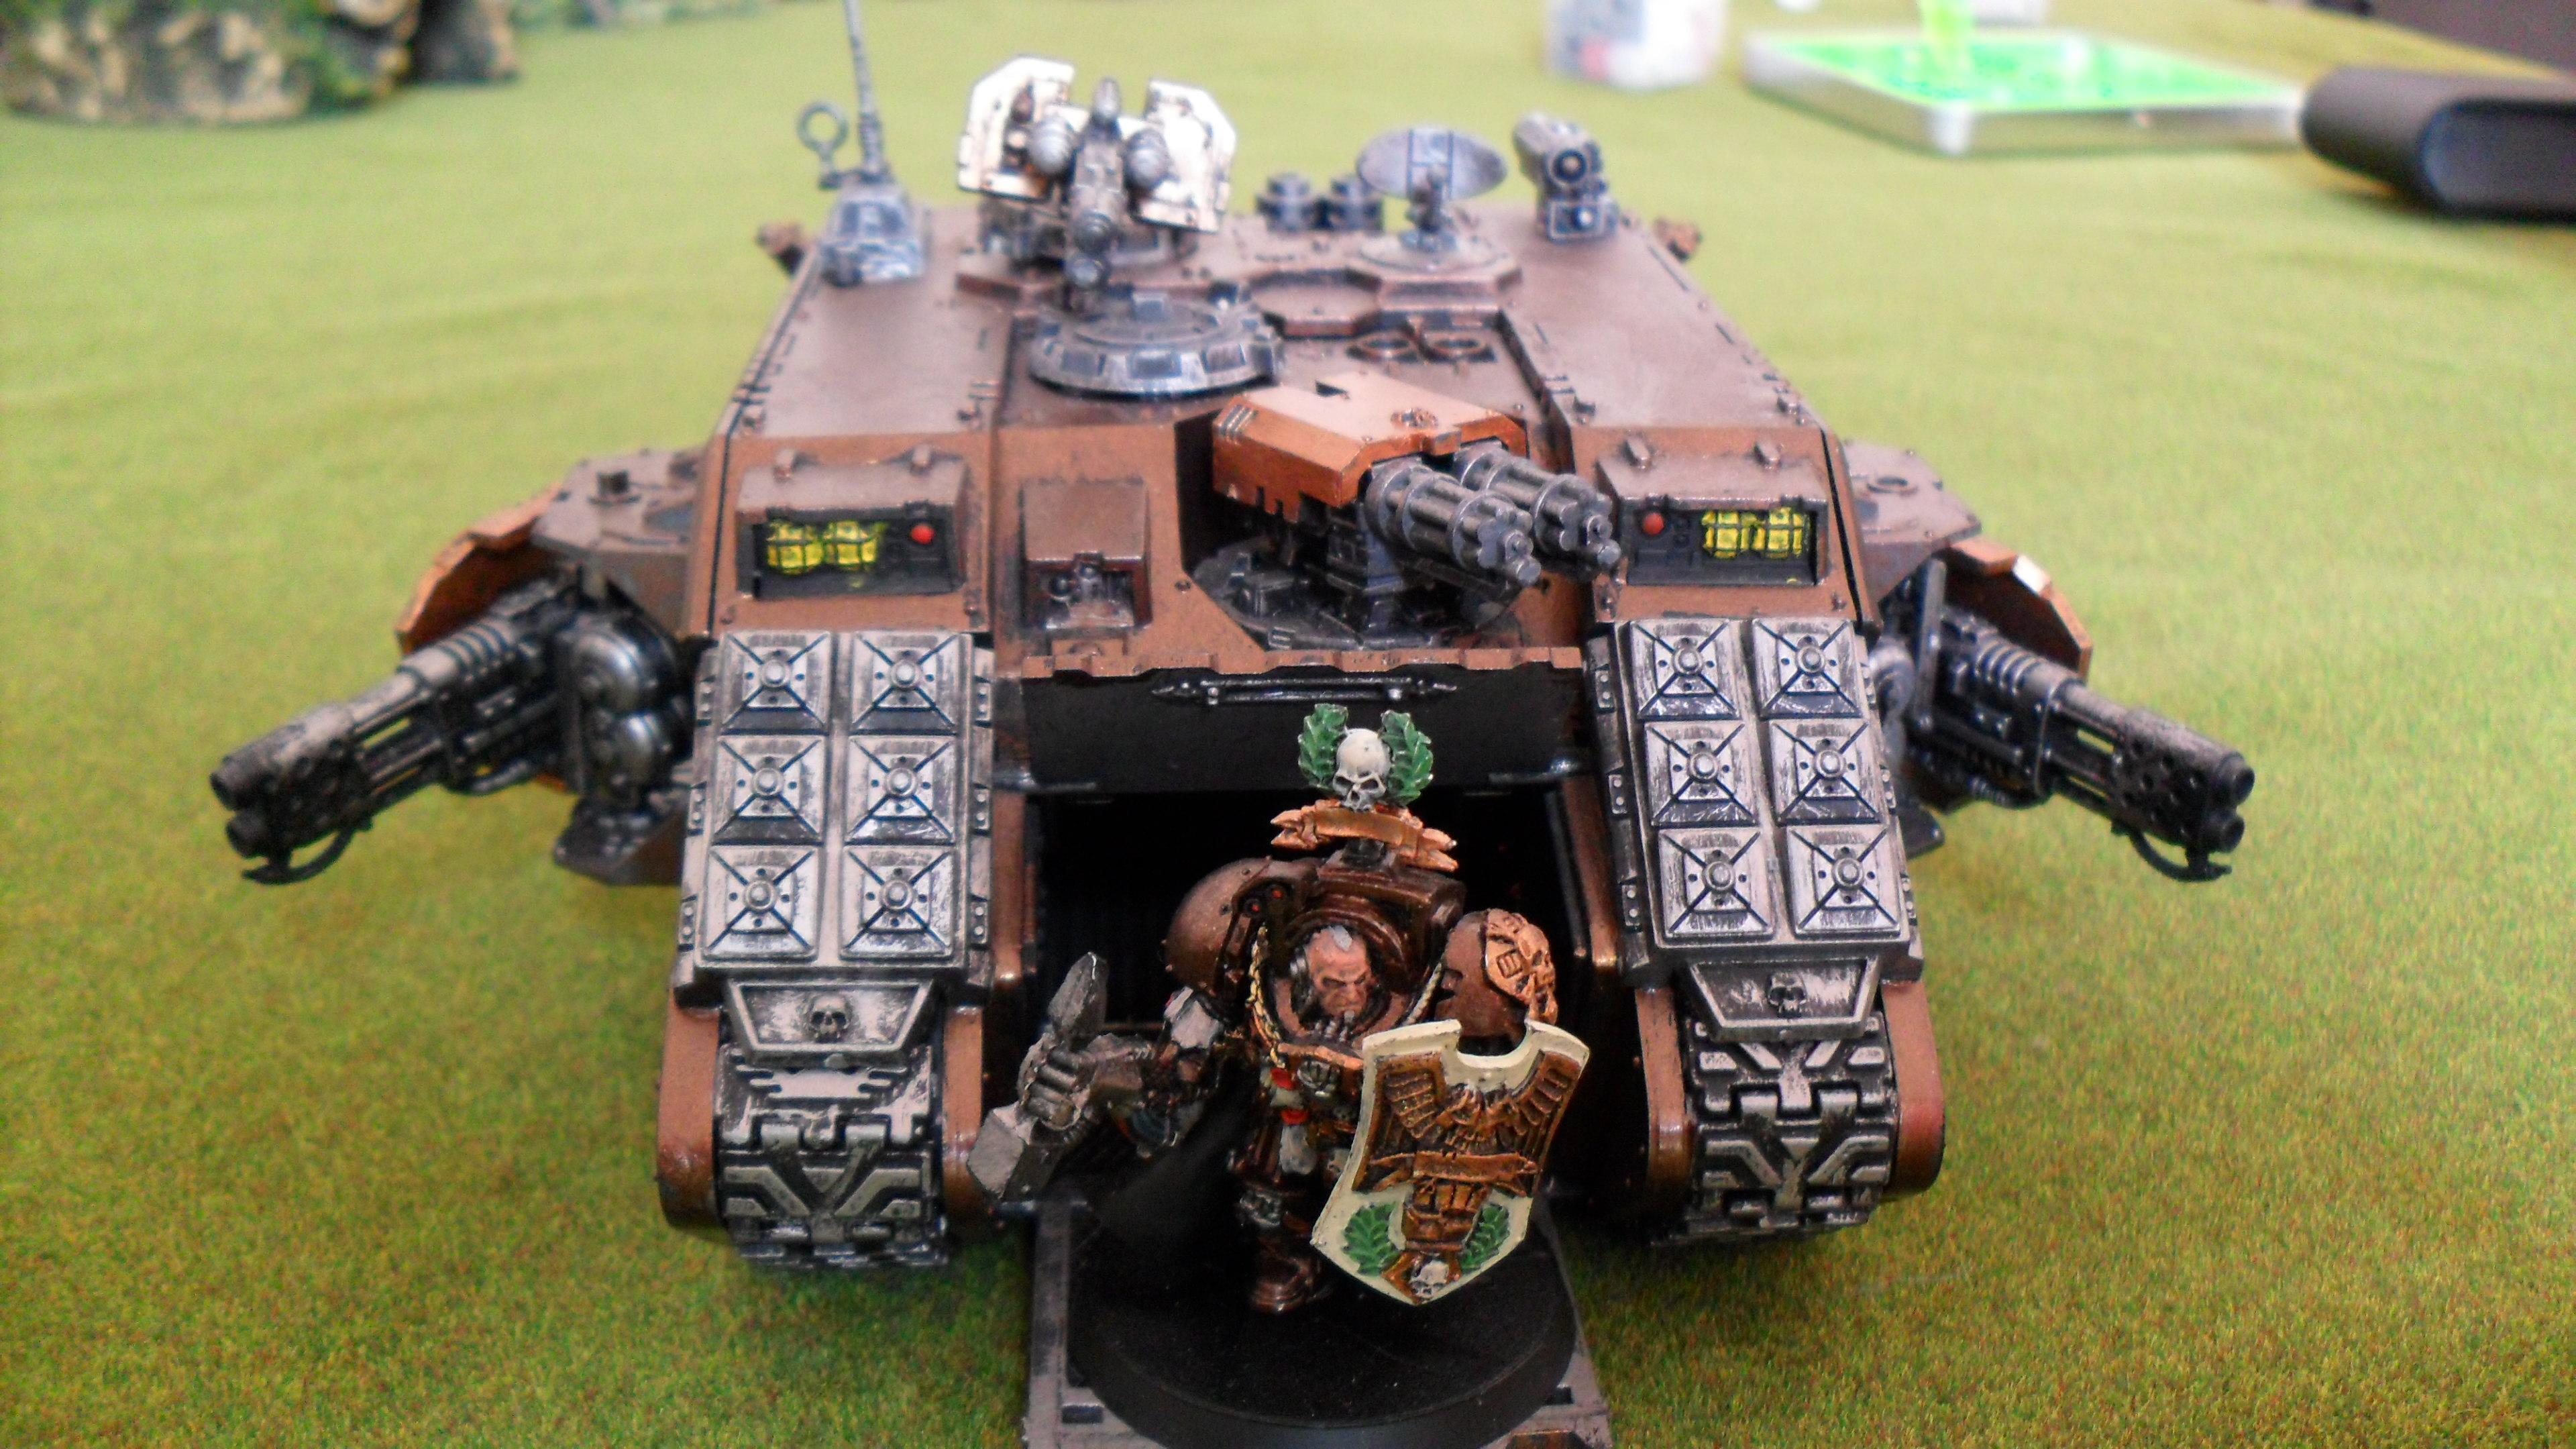 Commander, Land Raider, Lysander, Salamander, Space Marines